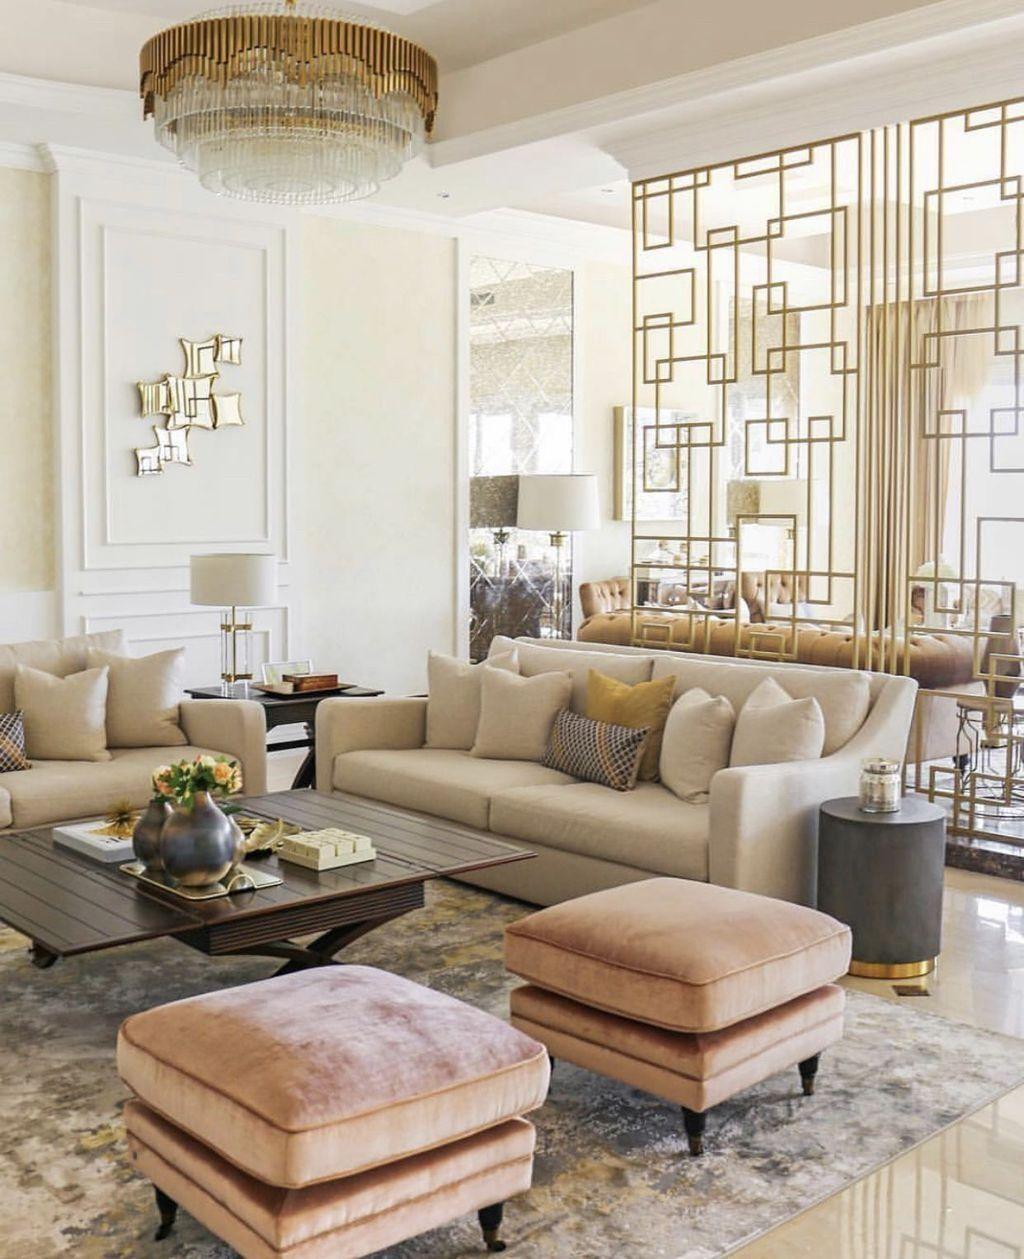 16 Luxurious Modern Living Room Decor Ideas  Décoration salon